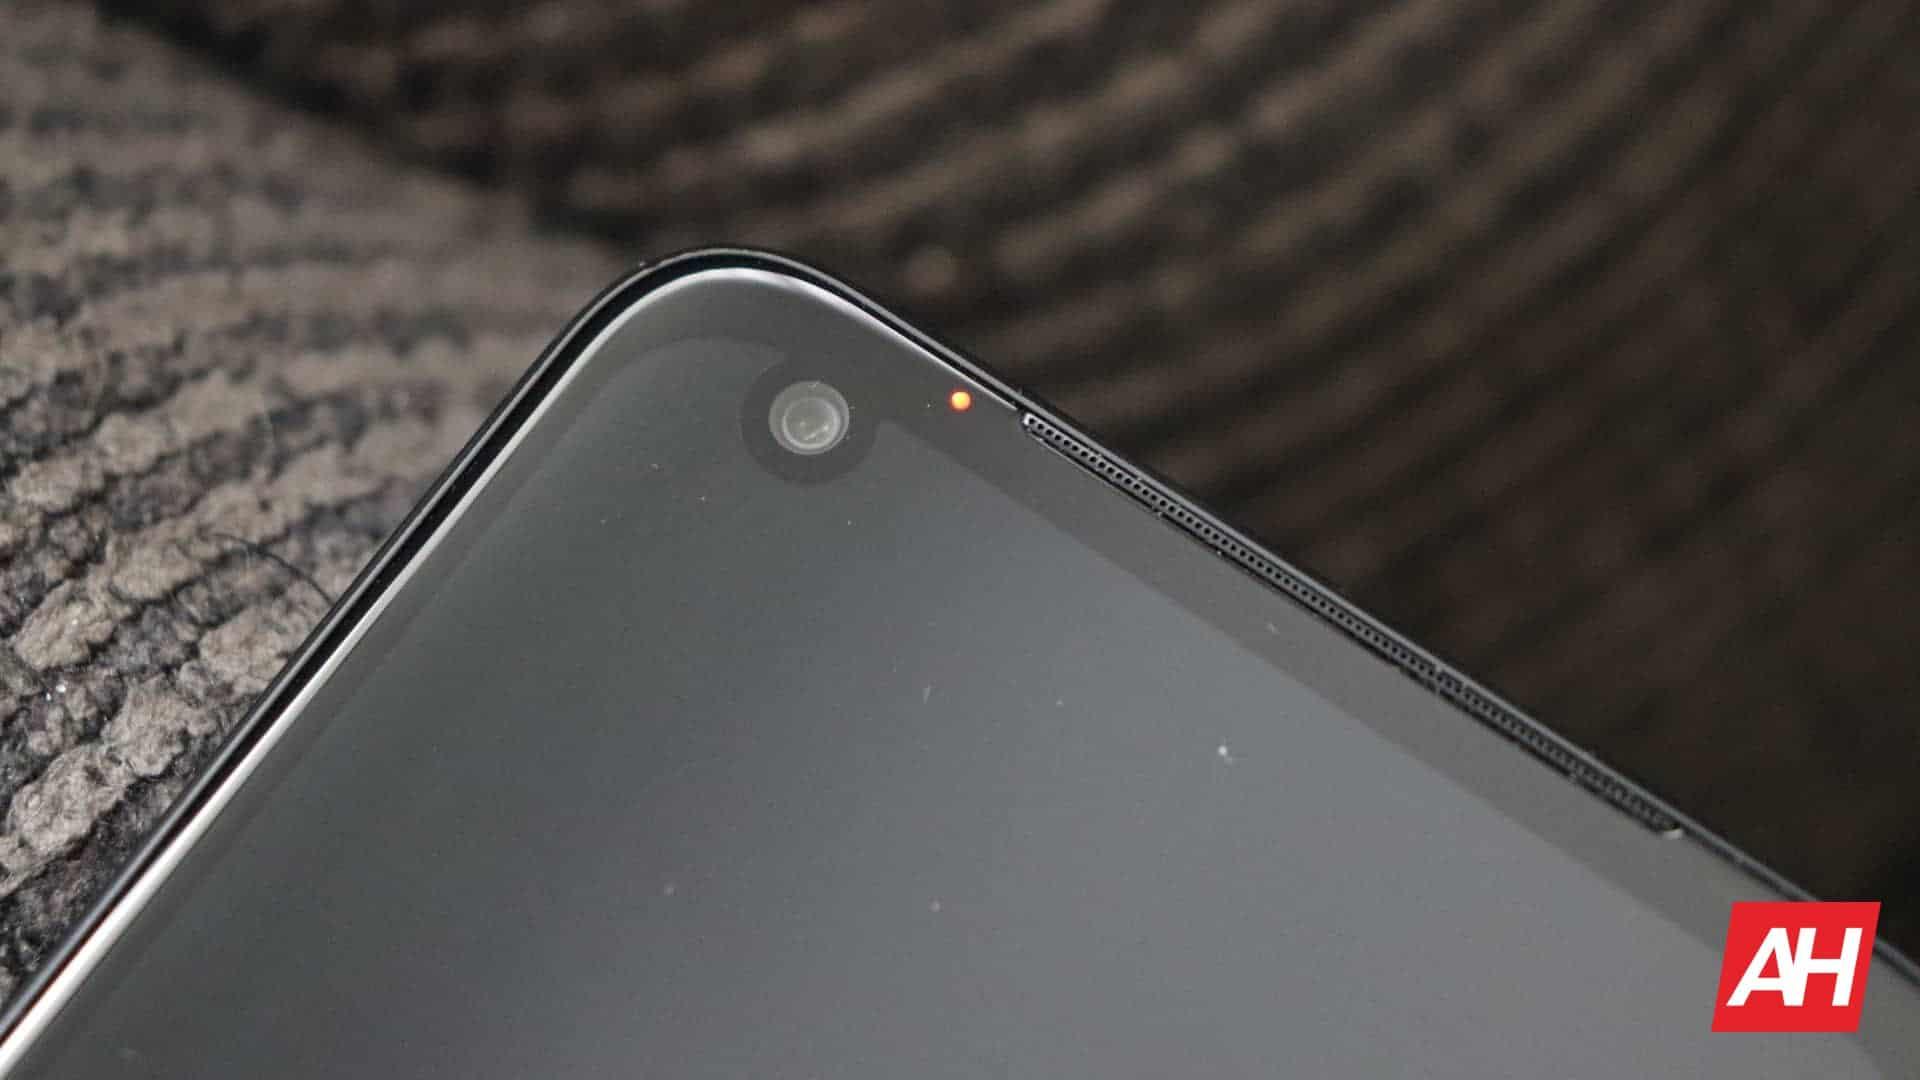 04 Orbic Myra 5G review battery DG AH 2021